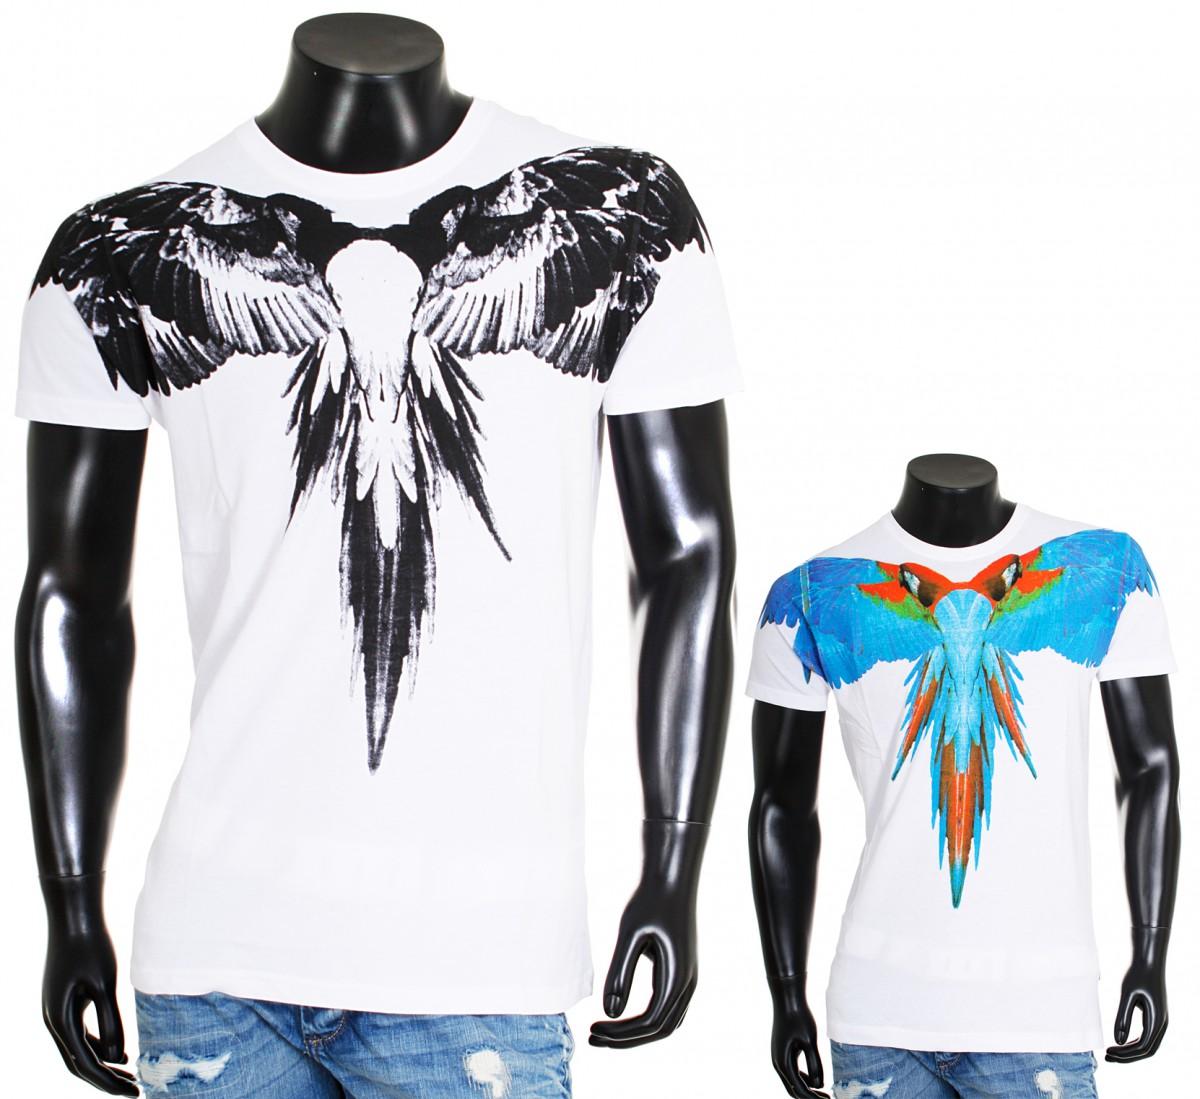 rundhals t shirt wei white sommer lookoptik print slimfit herren. Black Bedroom Furniture Sets. Home Design Ideas